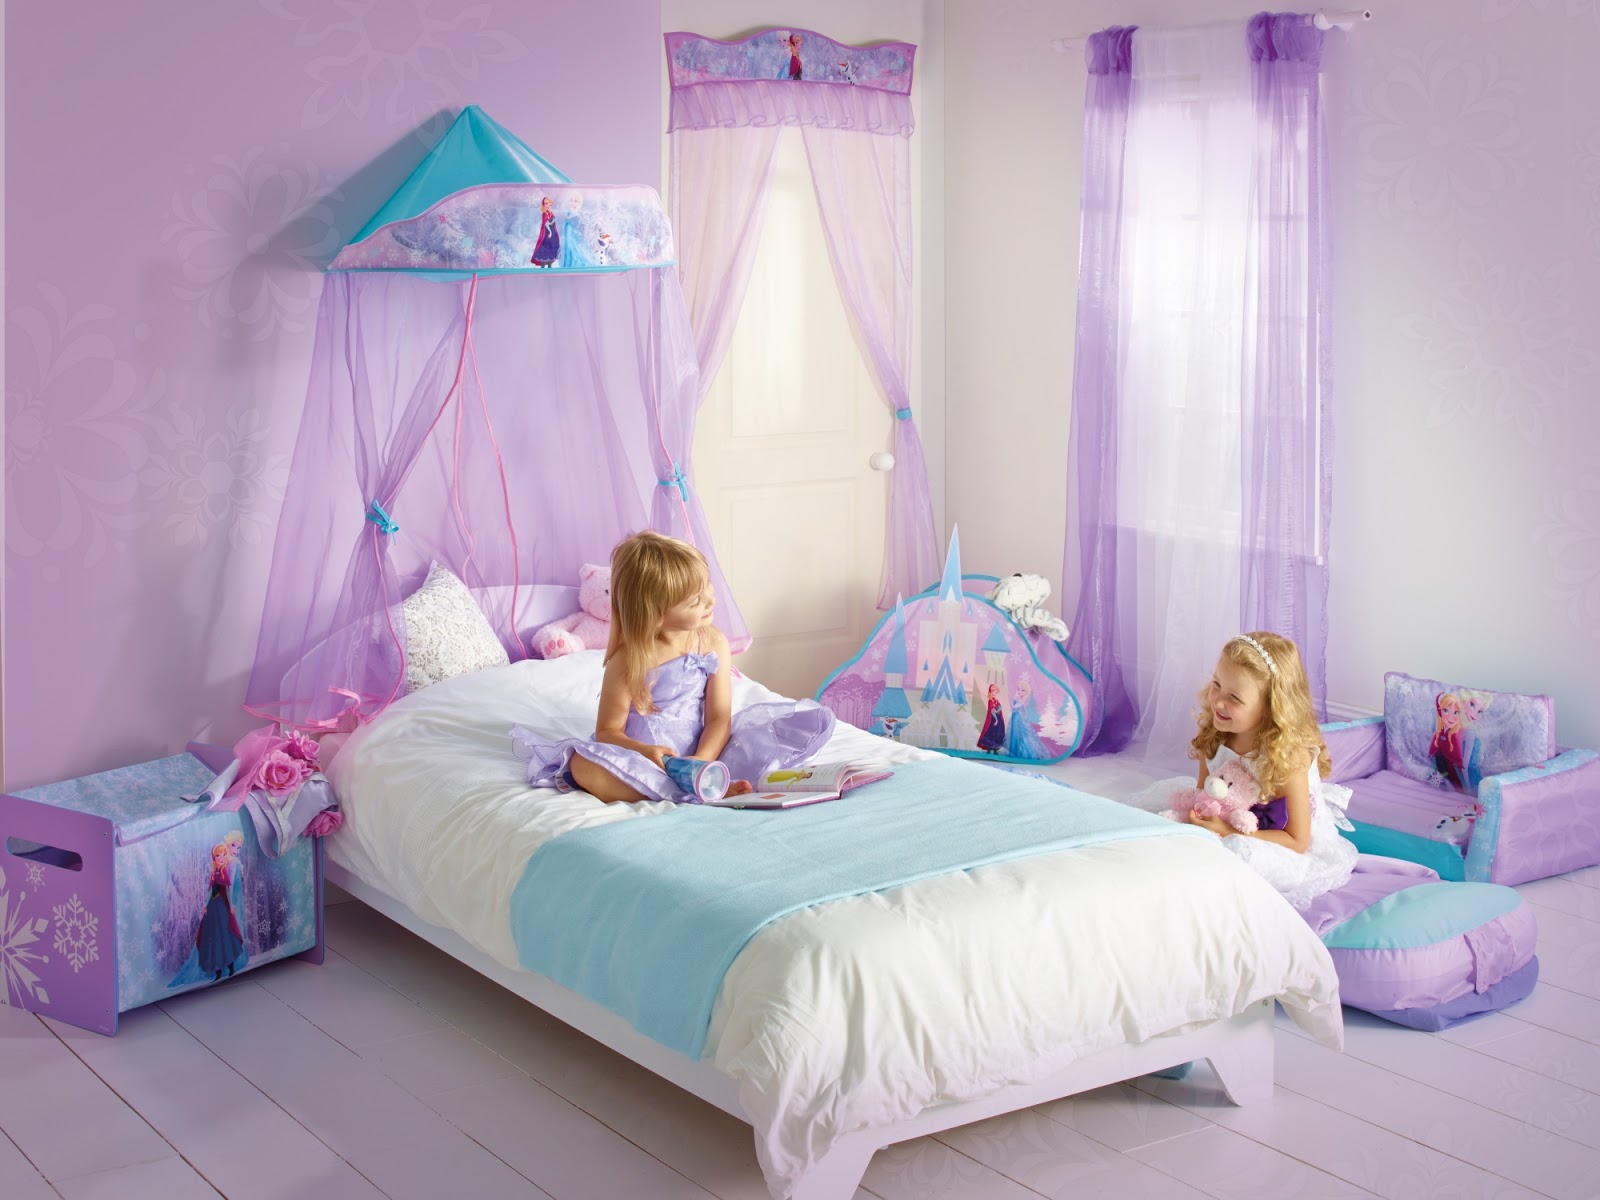 57 Desain Kamar Tidur Tema Frozen | Rumah Minimalis Sobat